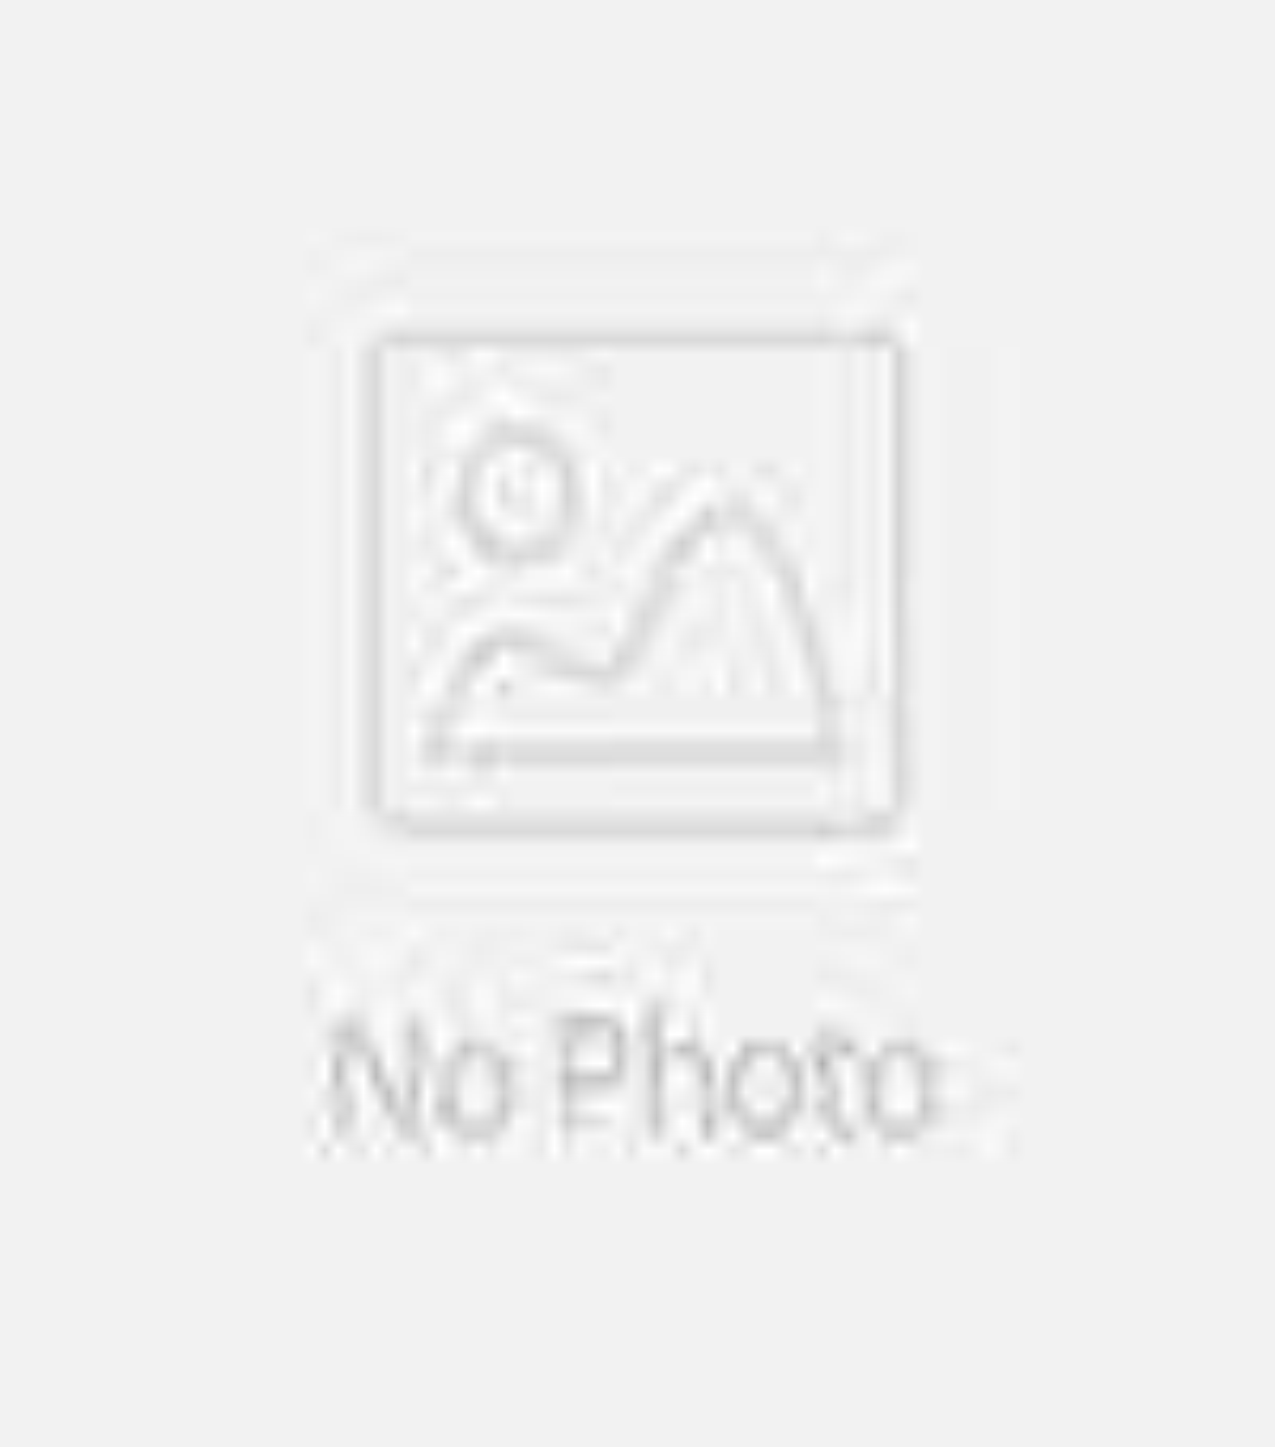 Exterior Security Doors View Security Doors Chemetals Product Details From